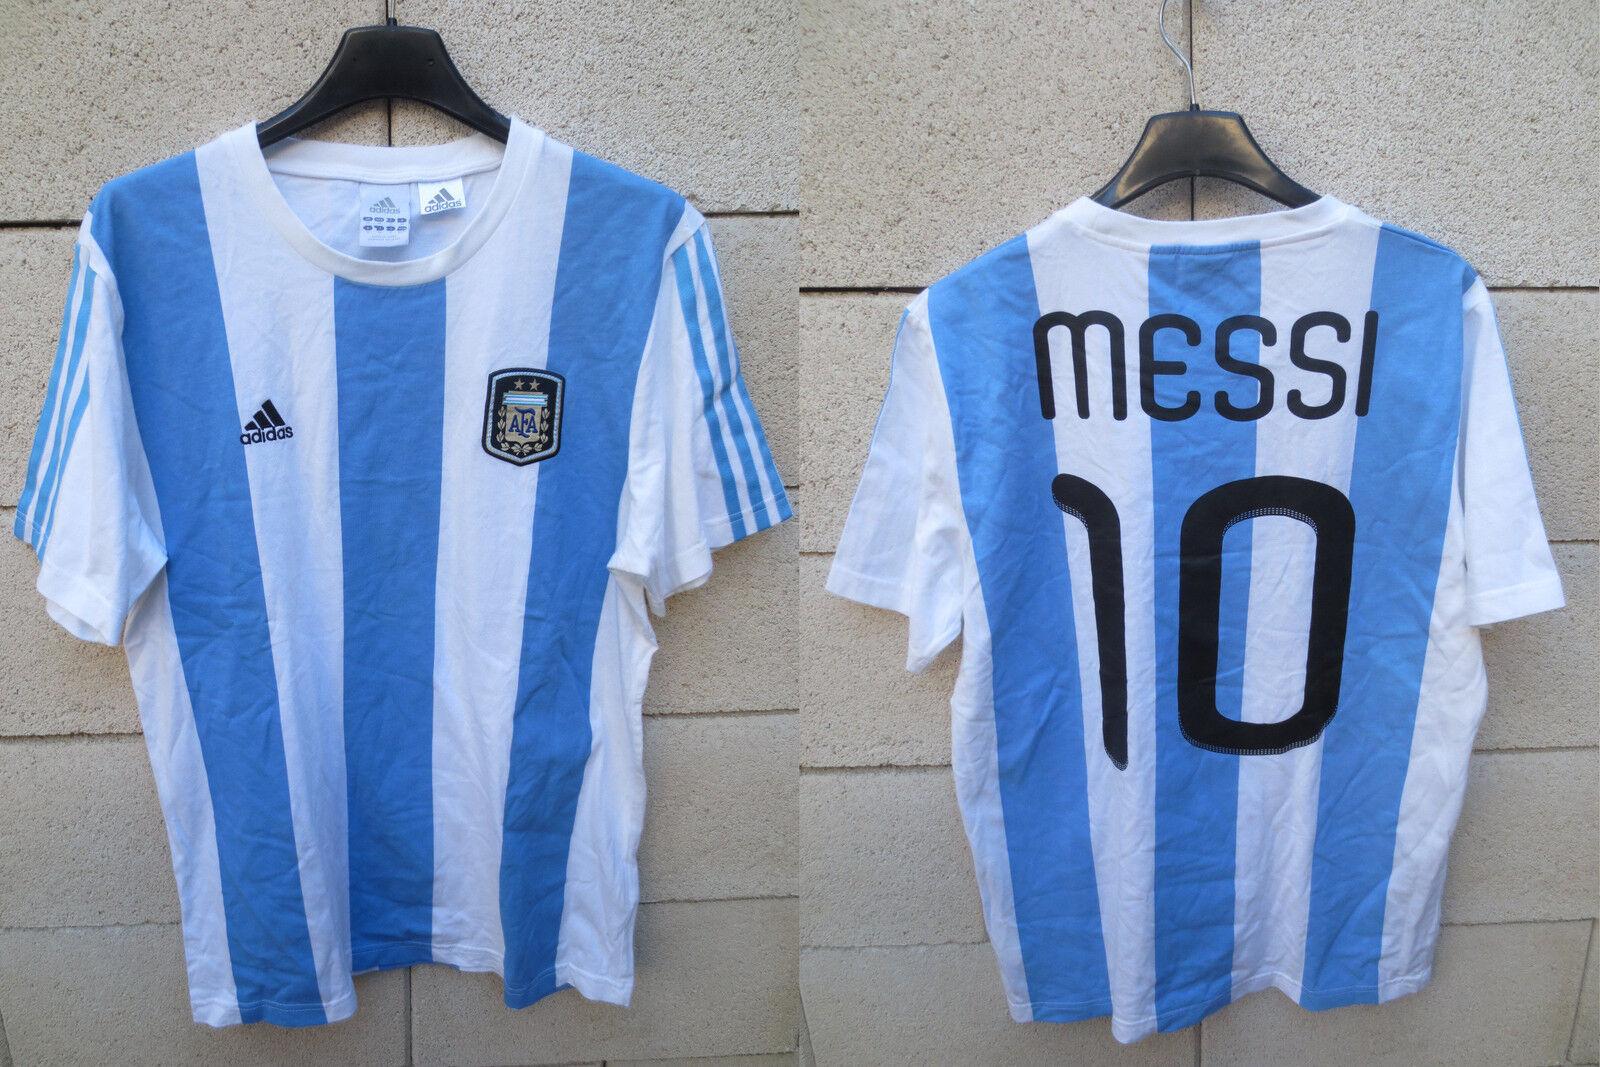 Maillot coton T-shirt silverINE silverINA Messi 10 rétro vintage ADIDAS M shirt